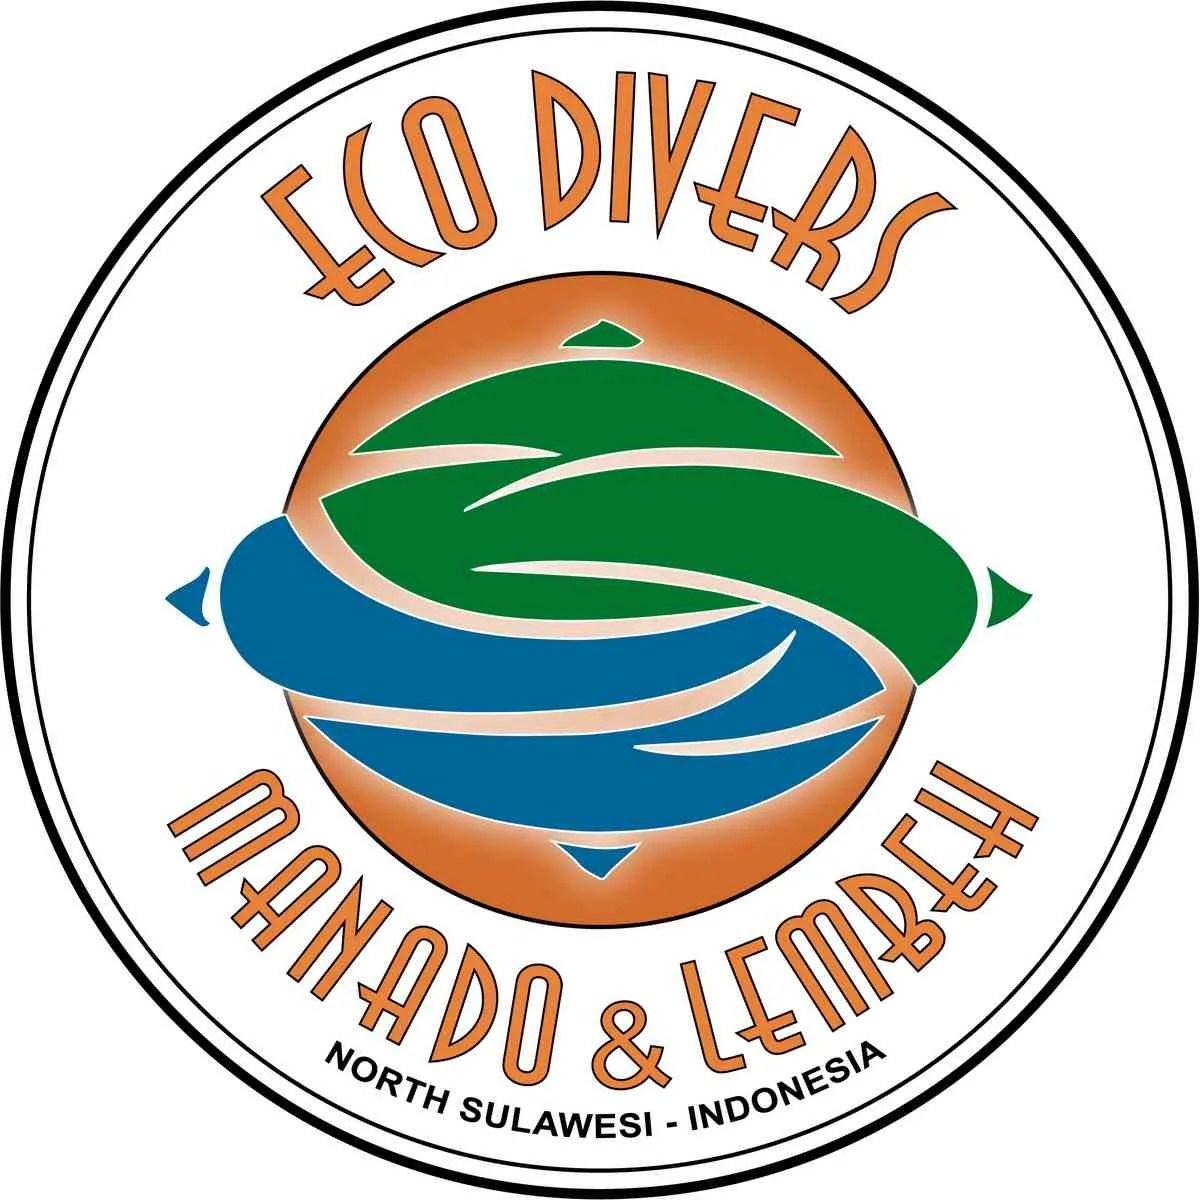 Eco Divers Lembeh & Manado